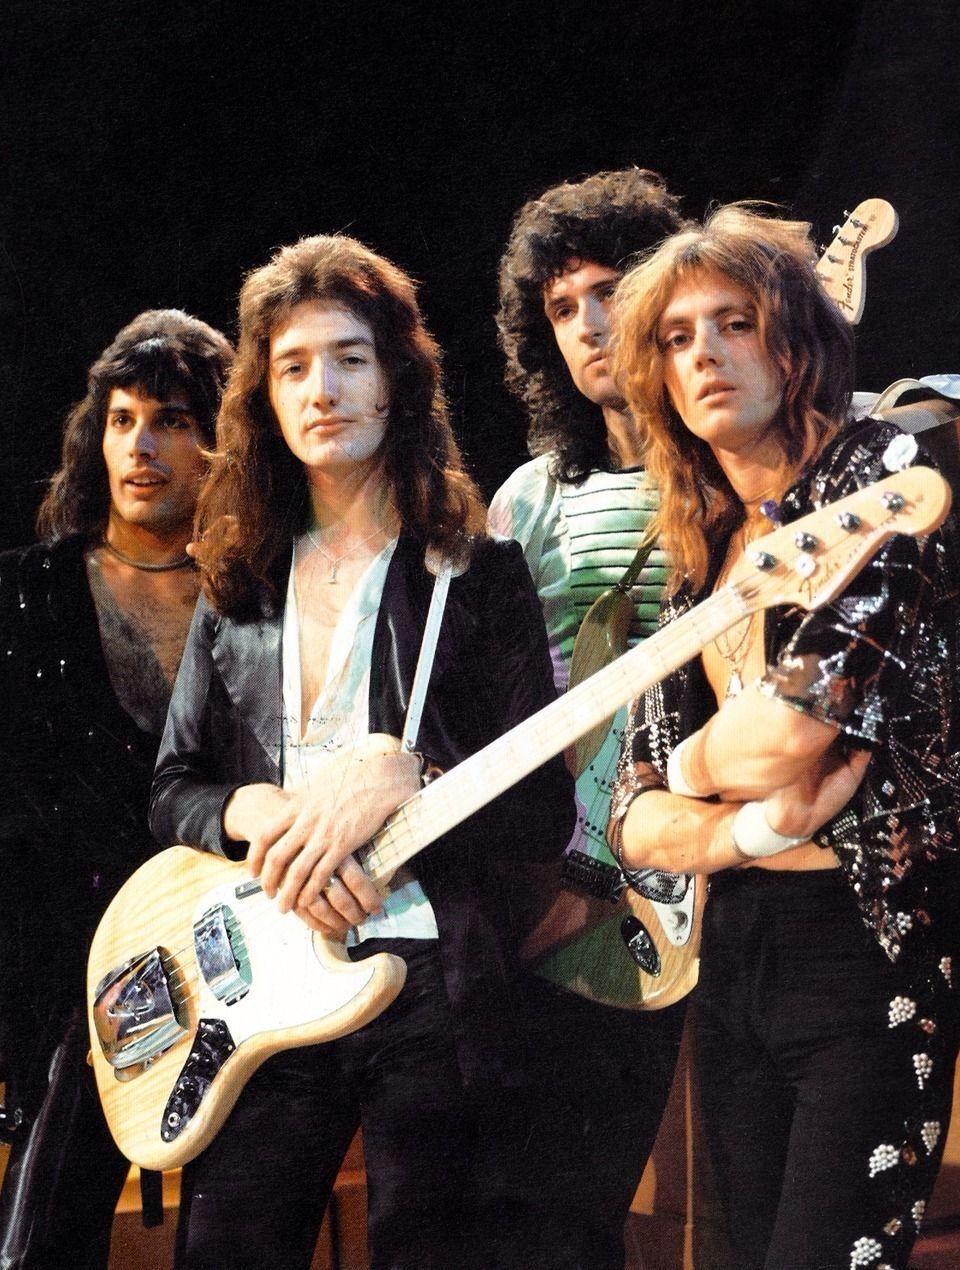 John Deacon: a legend against the success of Queen 30